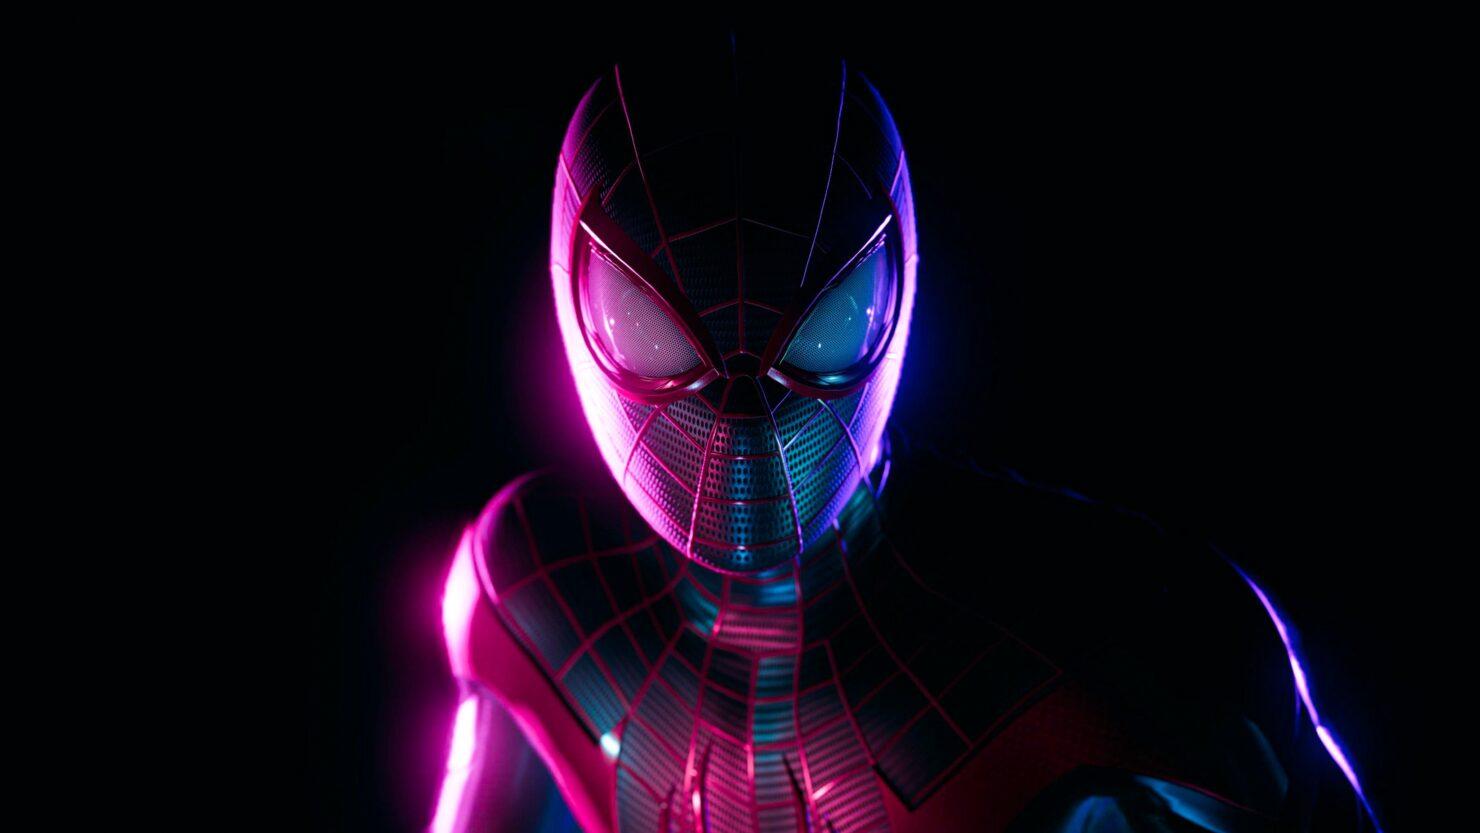 Spider-Man Miles Morales PS5 Update 1.10